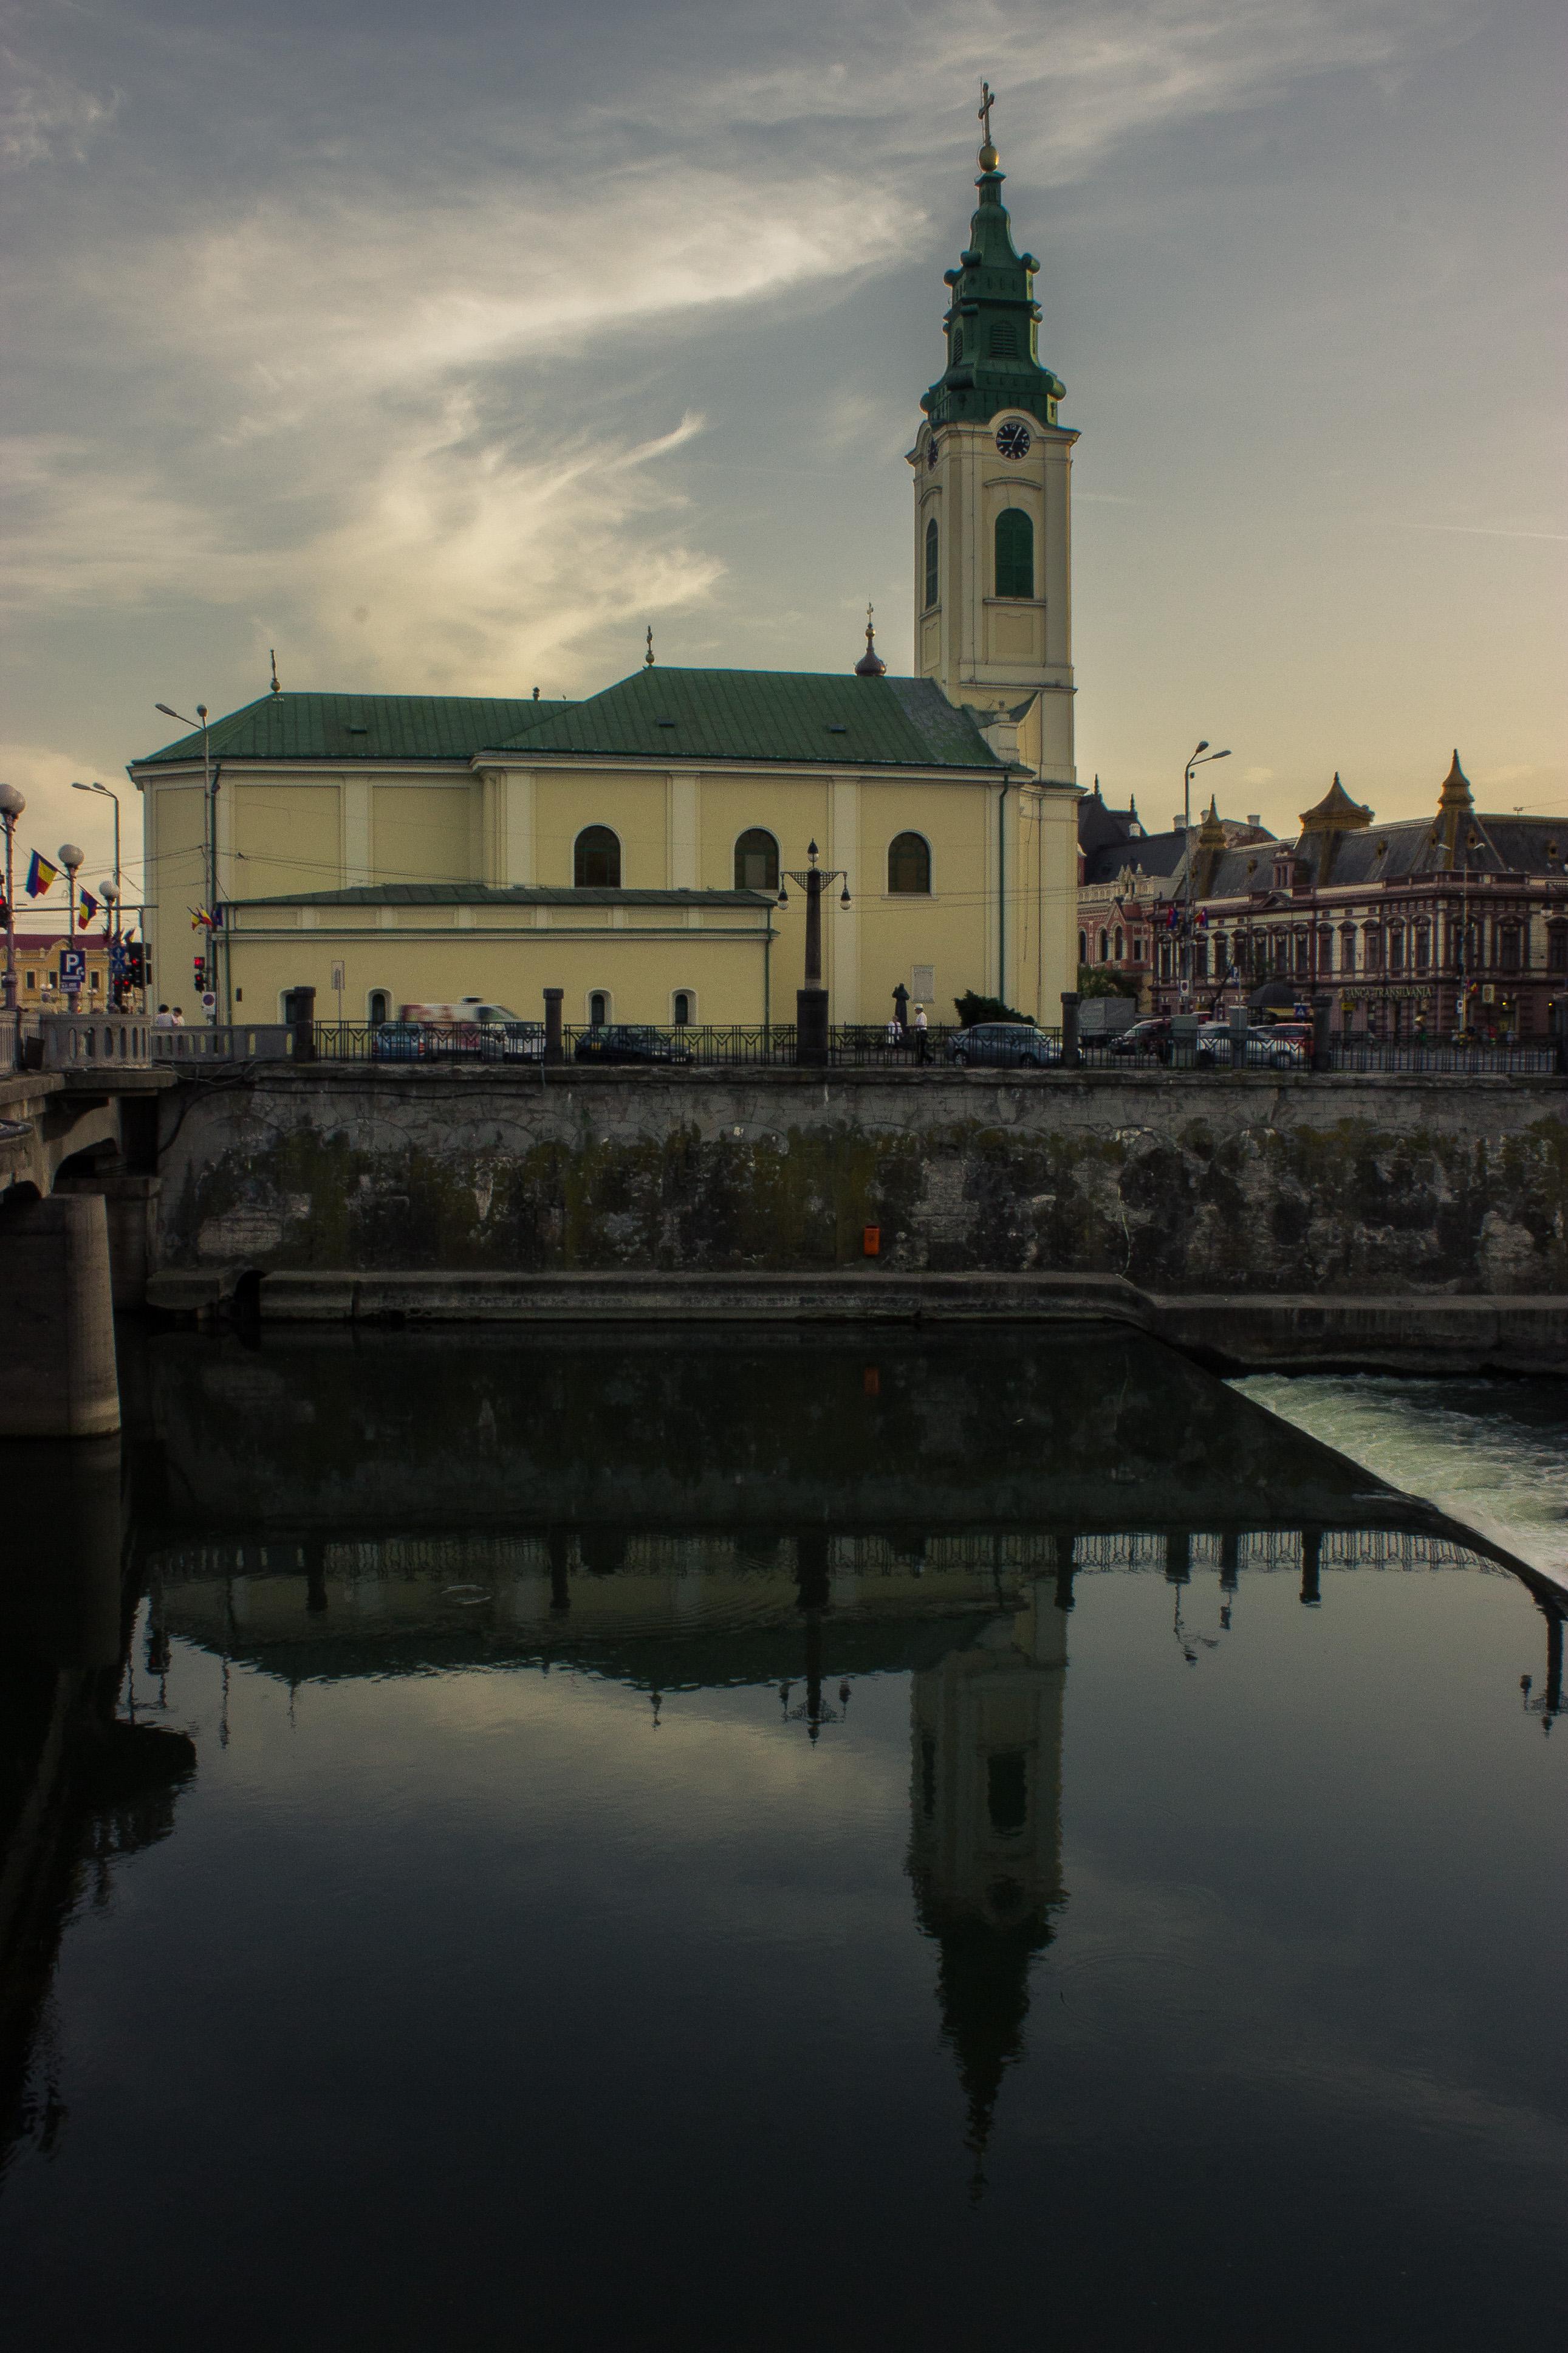 Biserica-Sf-Ladislau-reflec